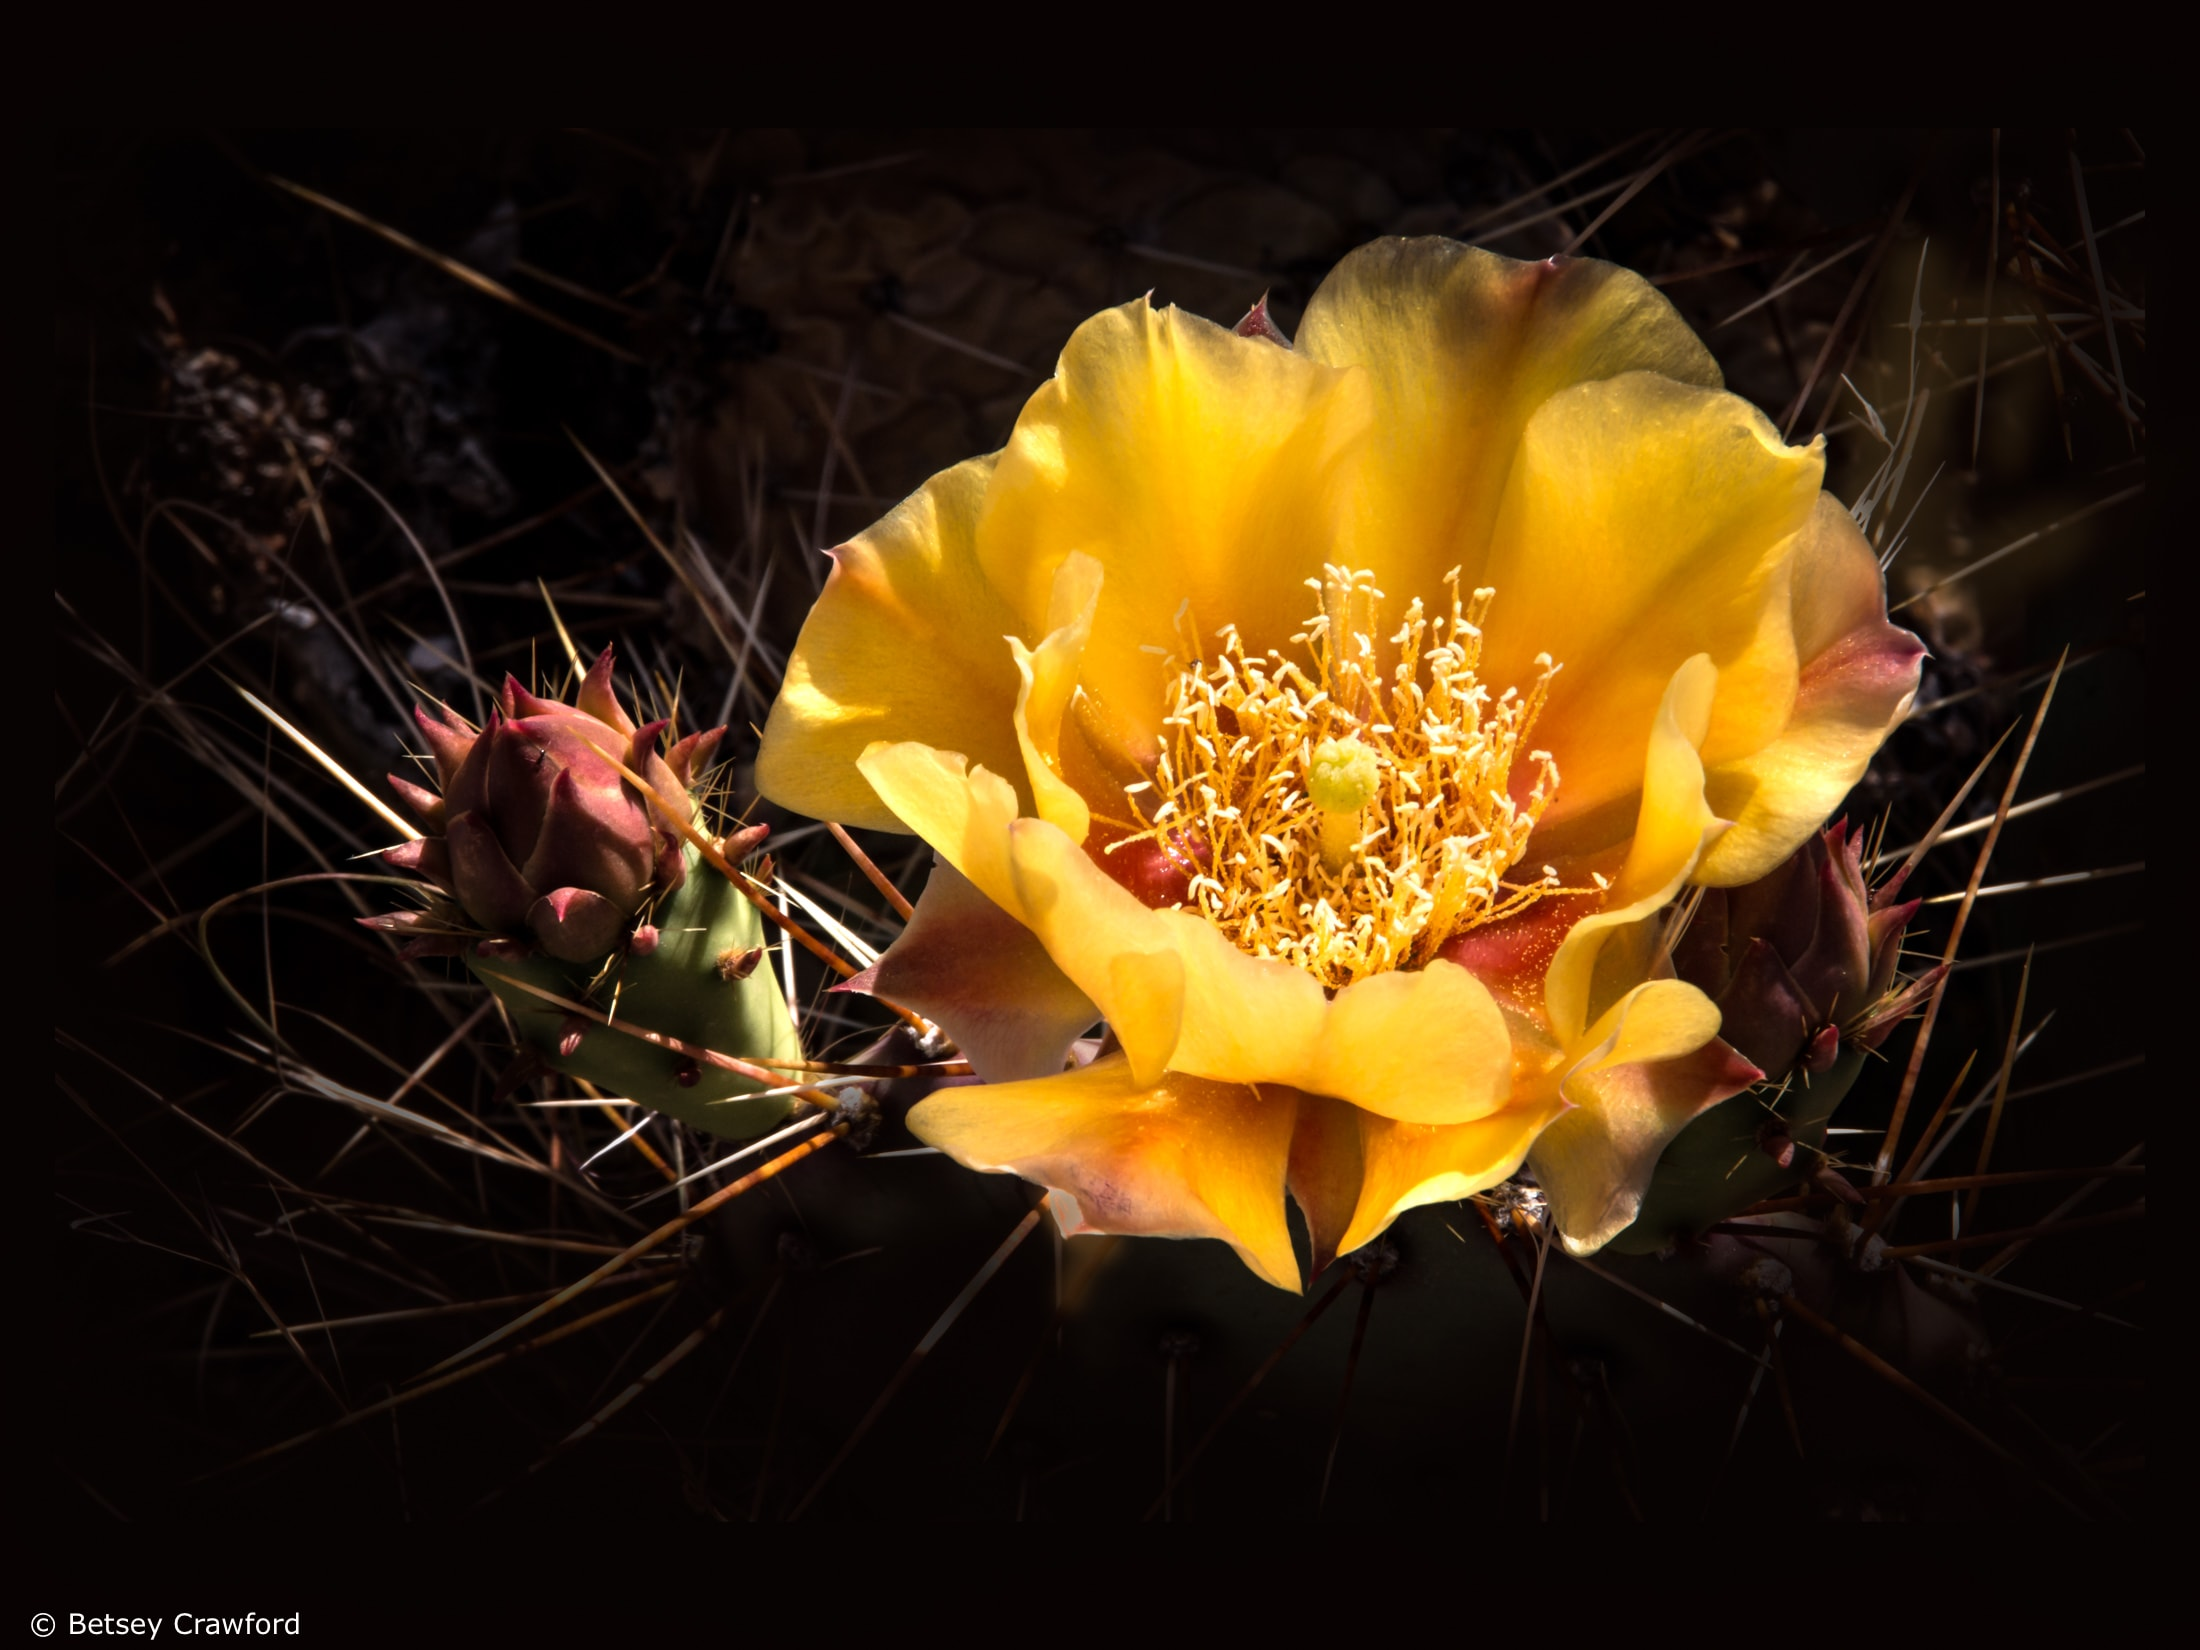 Desert prickly pear cactus (Opuntia phaeacantha) Corona Arch trail in Moab, Utah